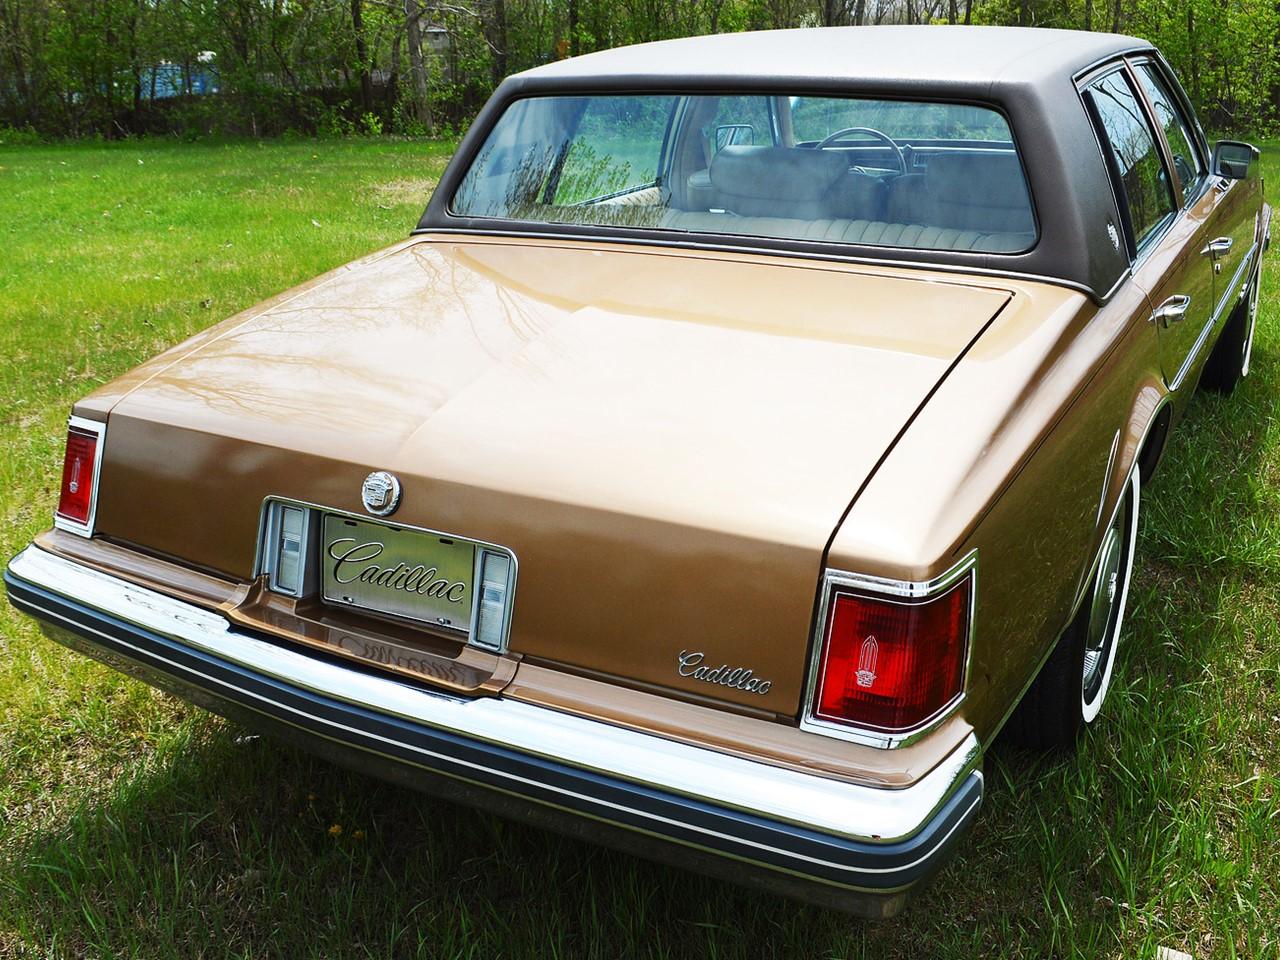 1976 Cadillac Seville 6